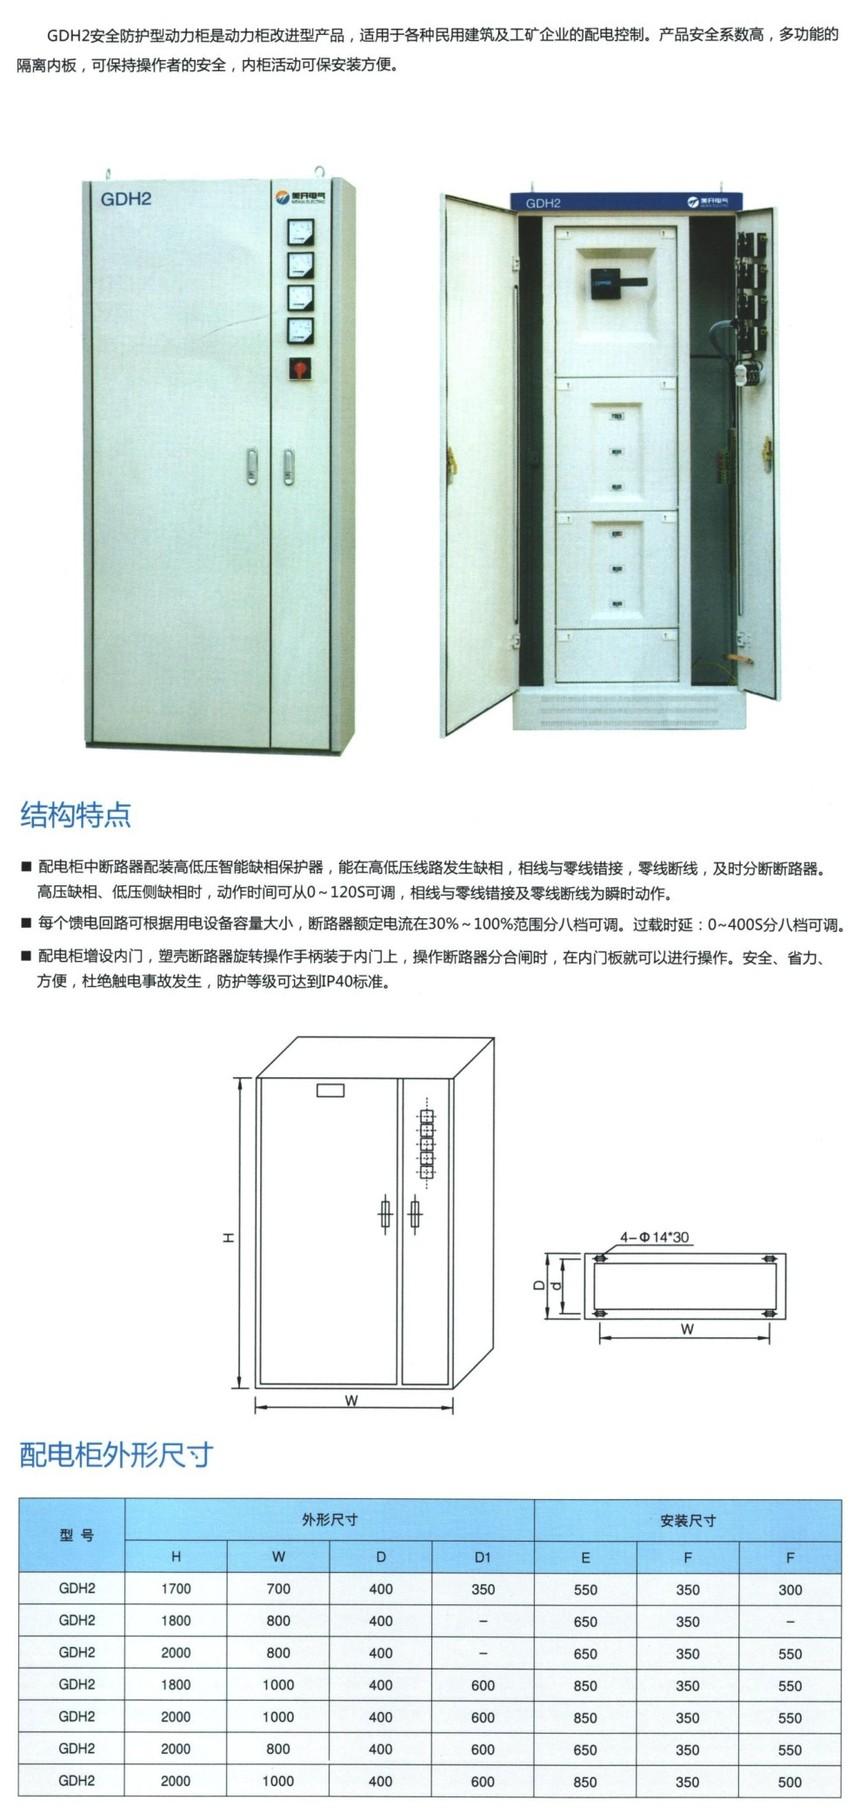 GDH2安全防护动力配电柜02.jpg